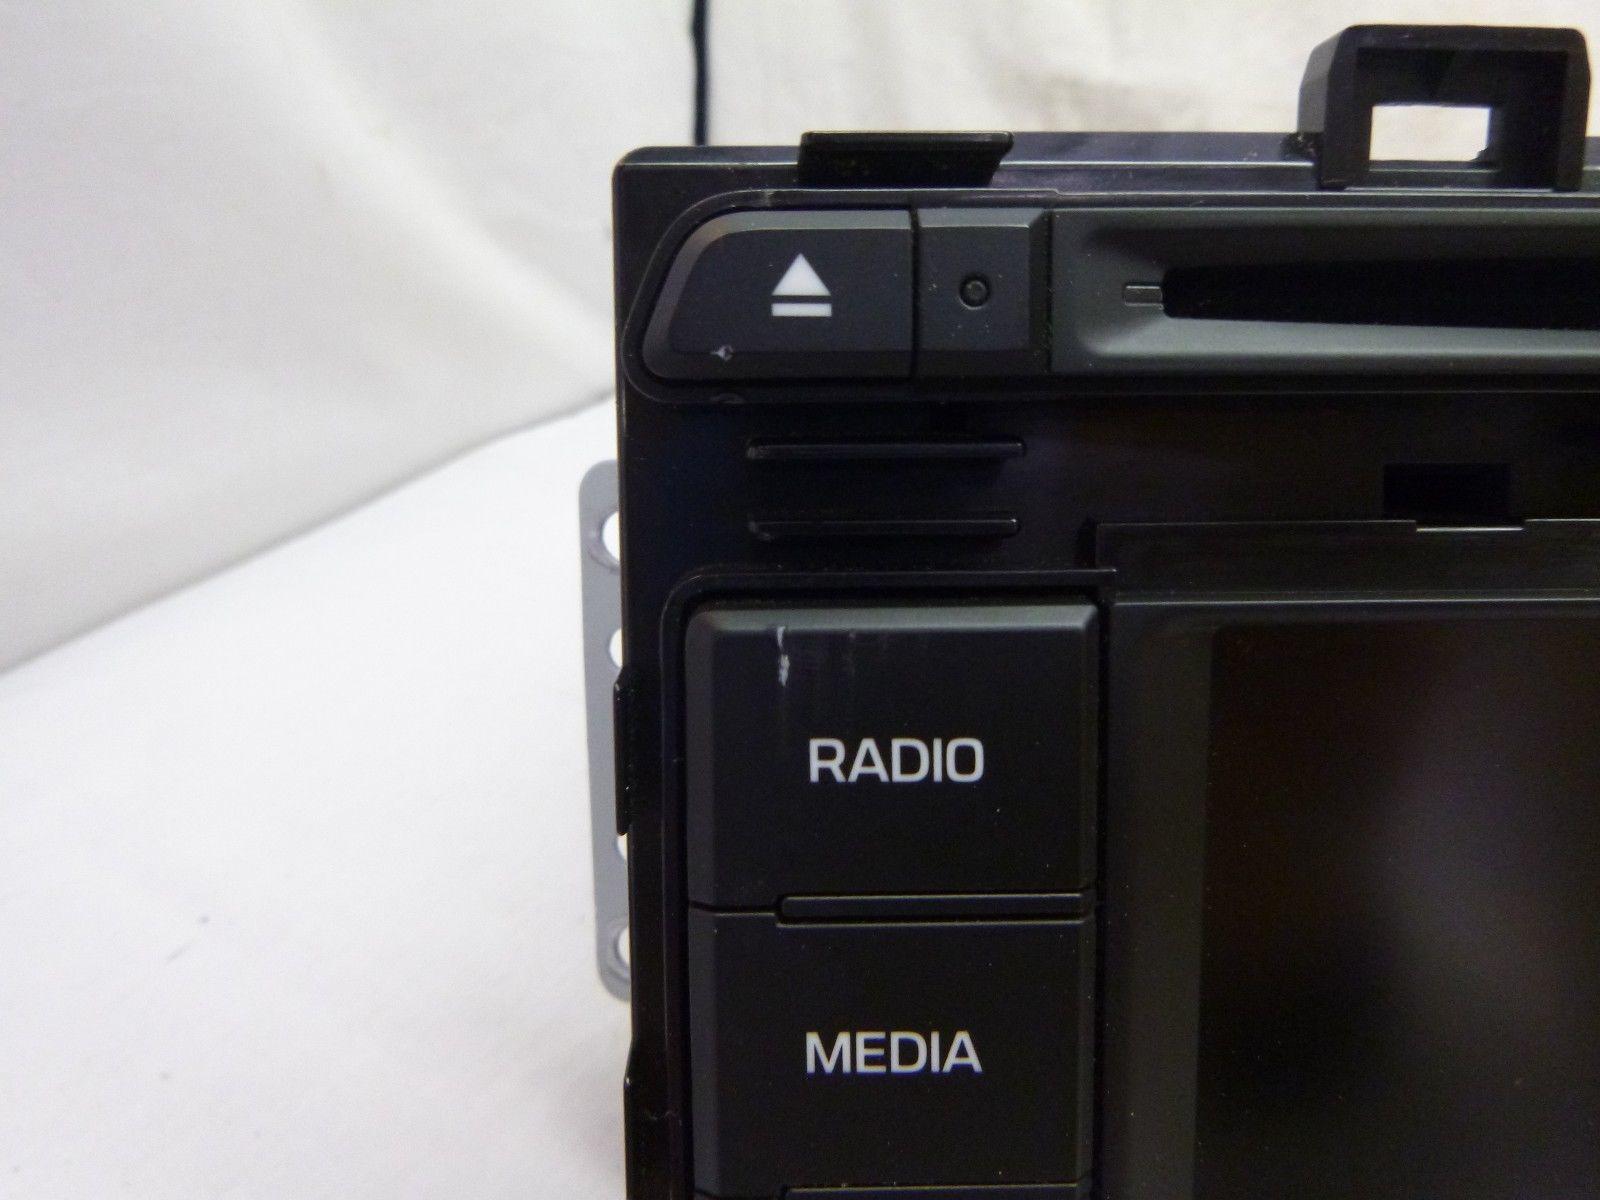 2015 15 Hyundai Sonata Radio Cd Player 96180-C20004X CJ1913